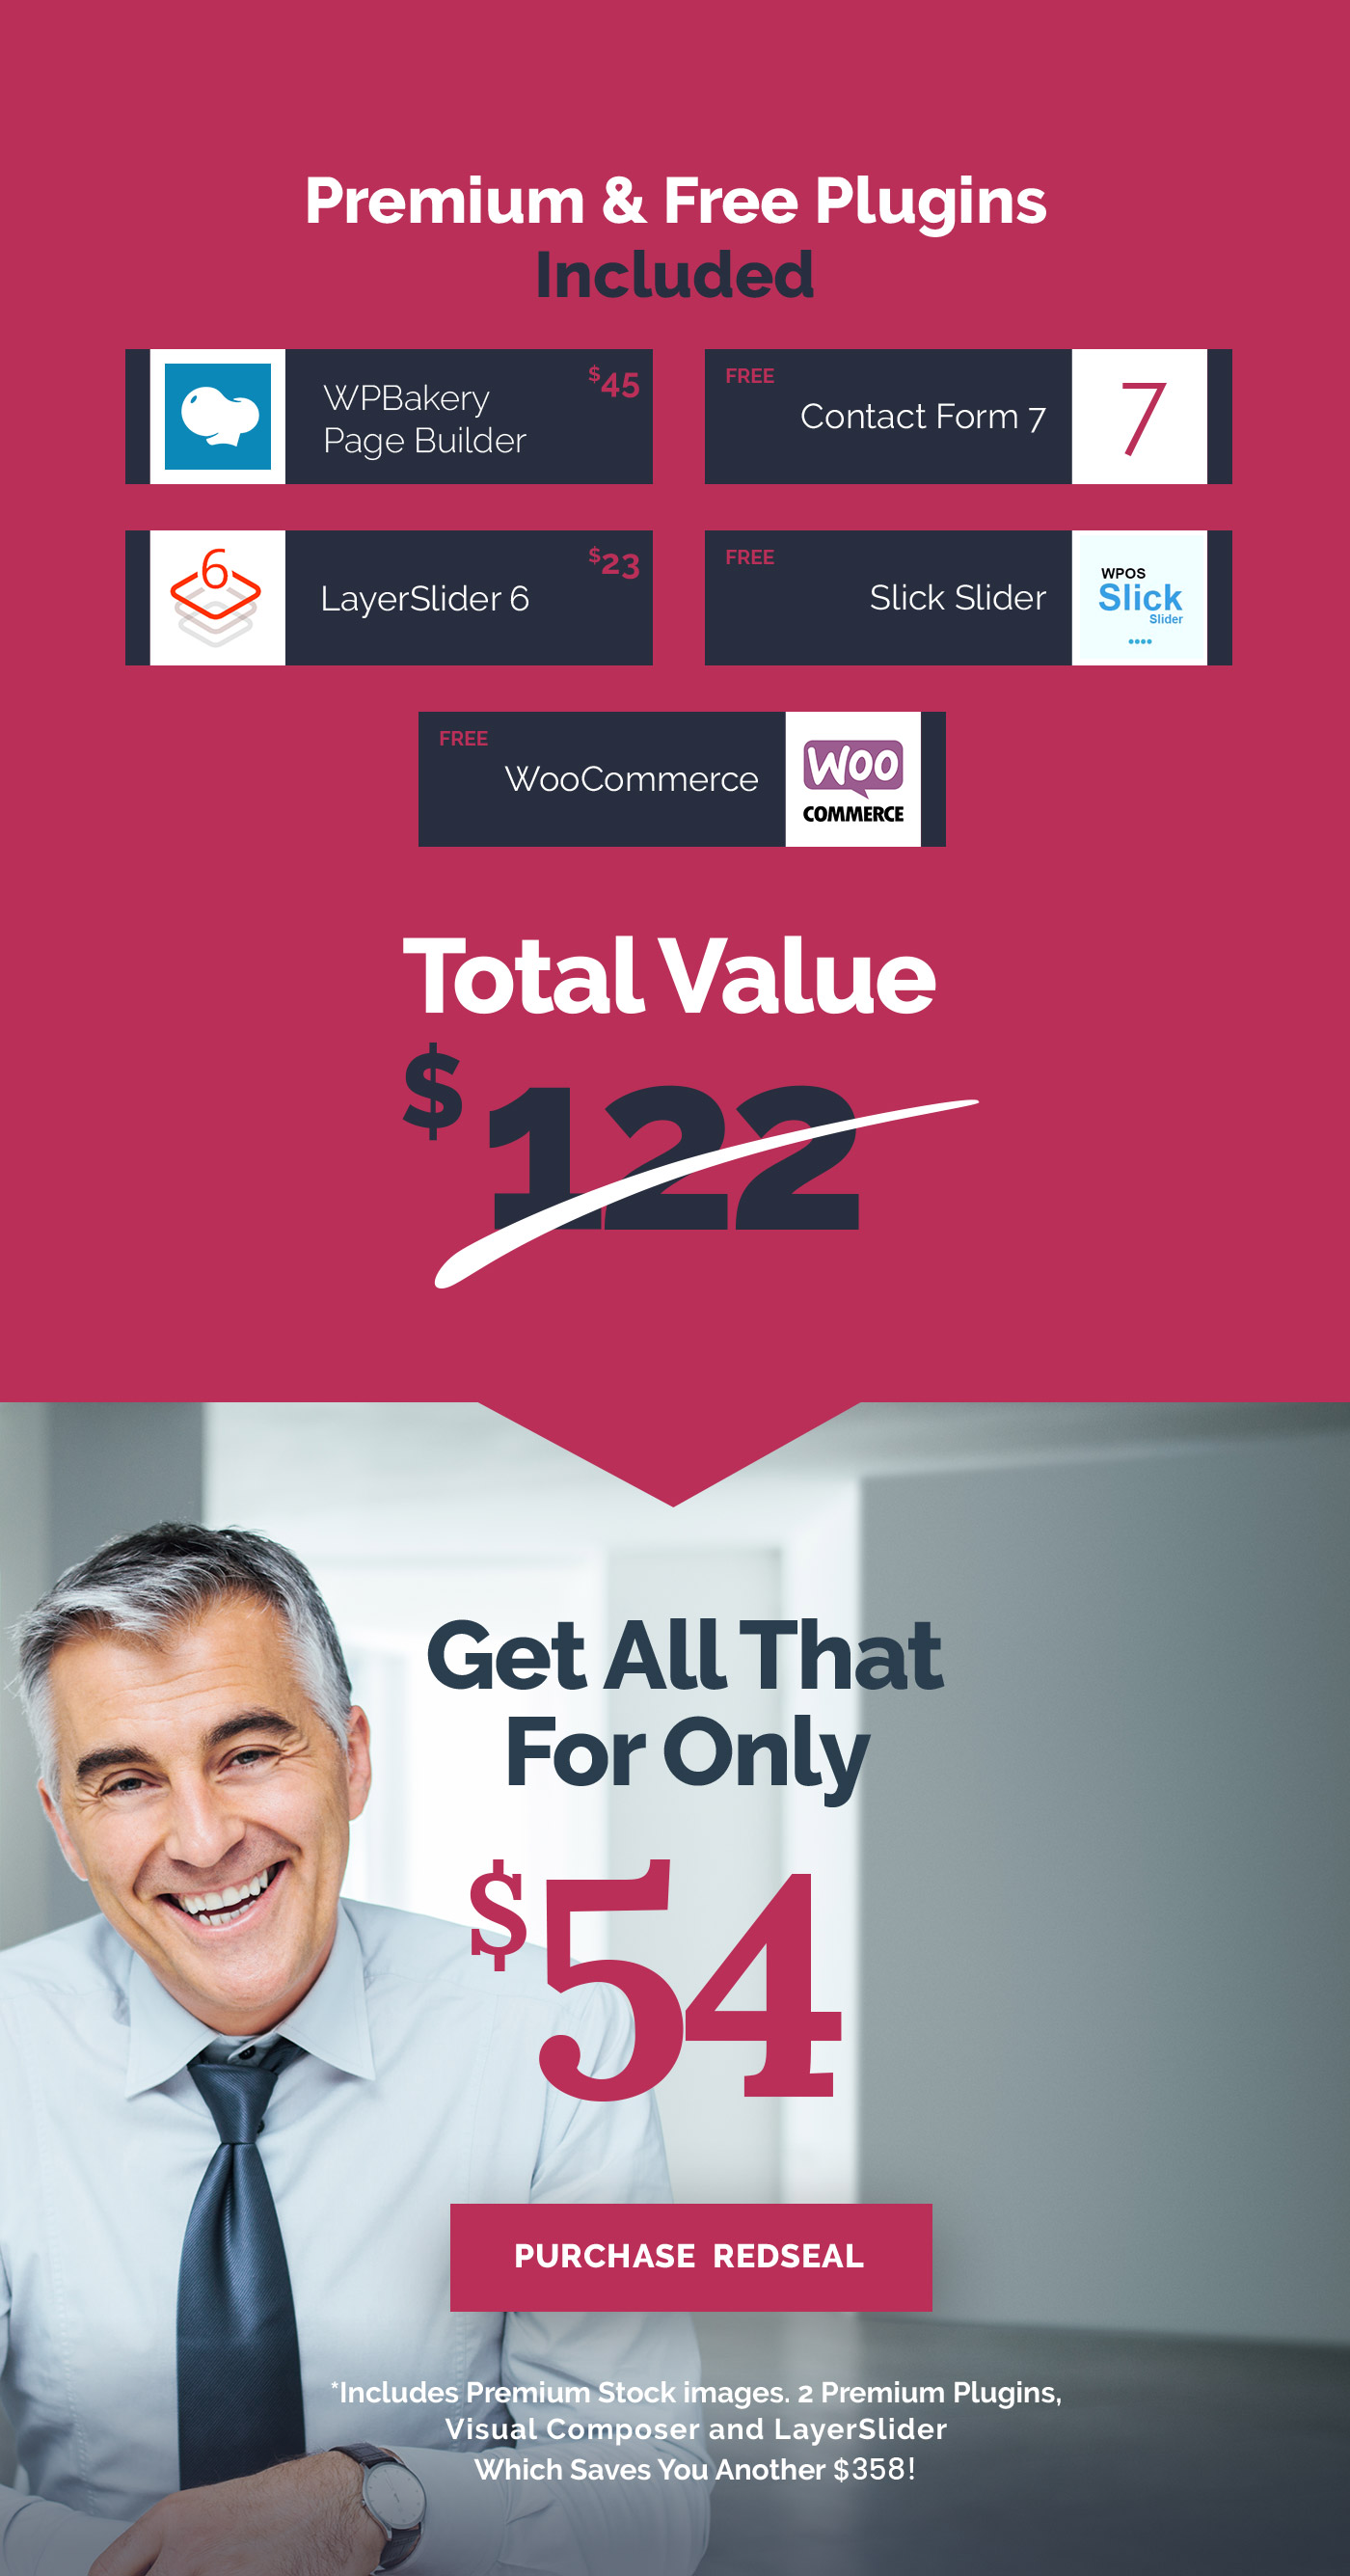 RedSeal Purchased Premium Features